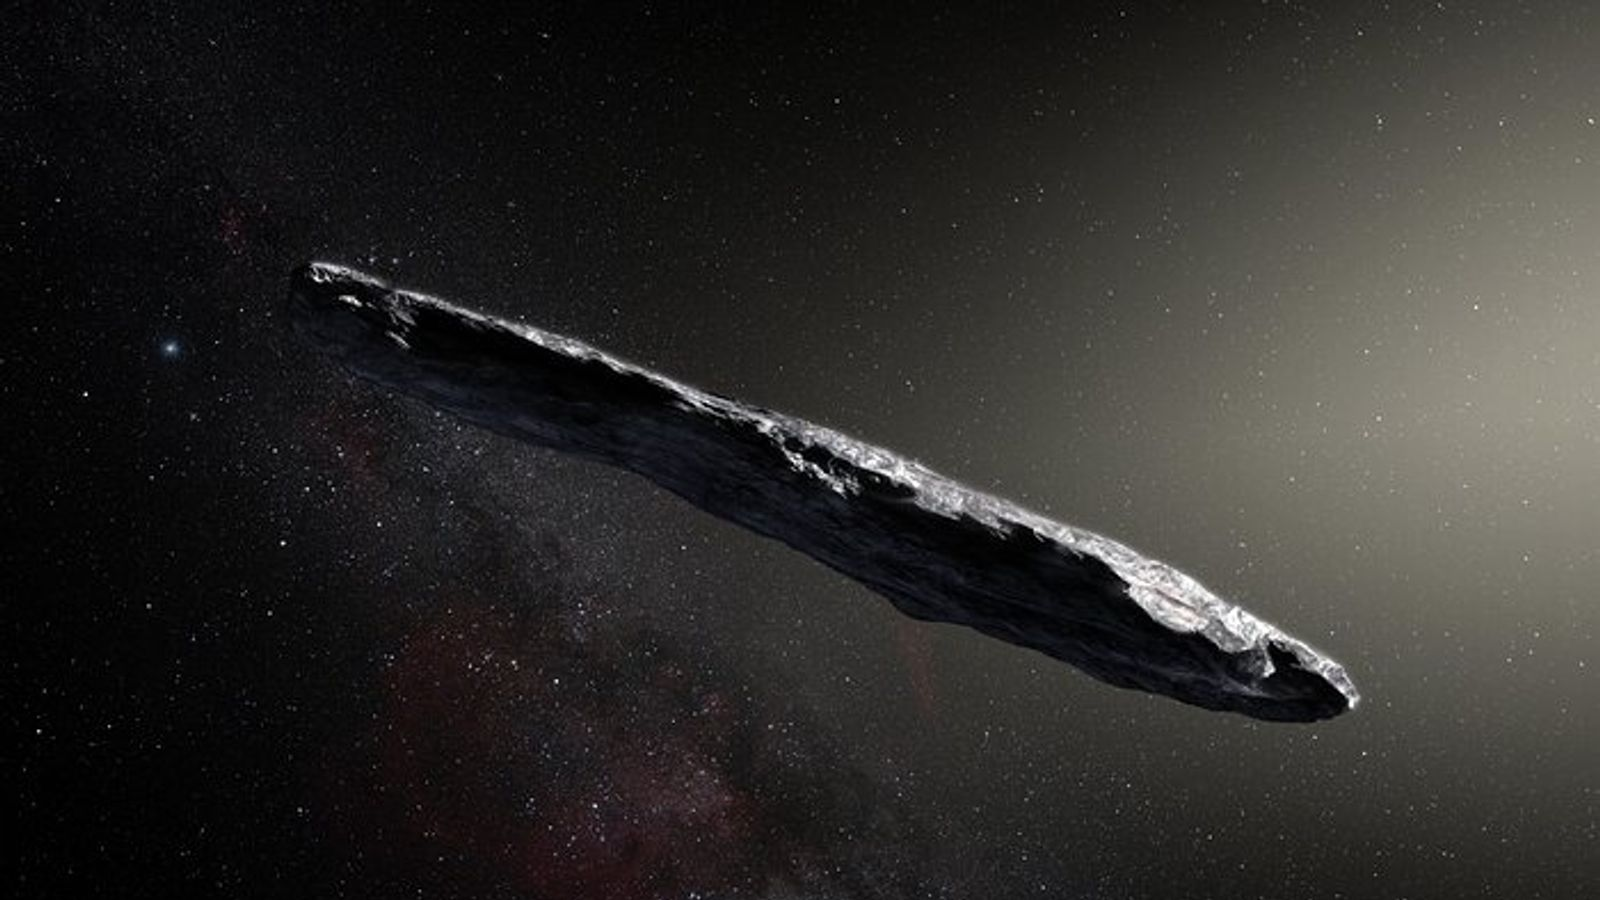 Scientists dispute 'alien spacecraft' suggestions